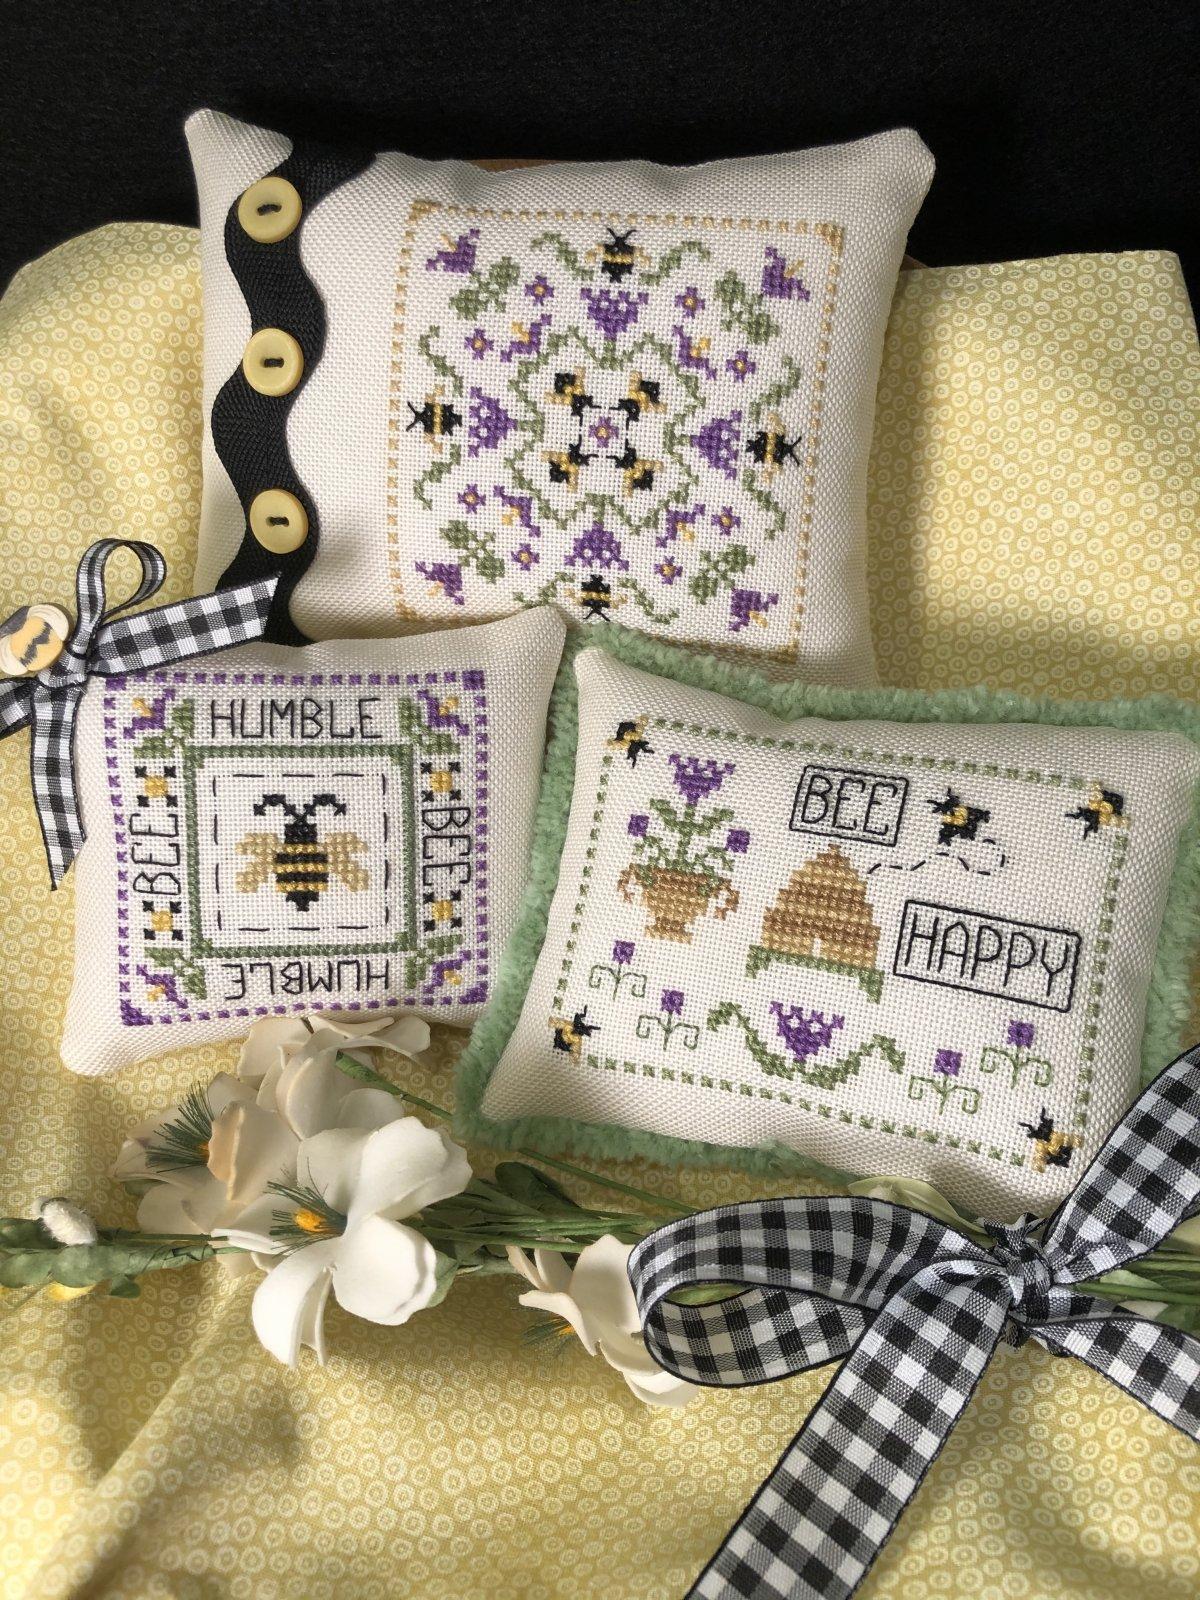 ScissorTail Designs - Humble Bee